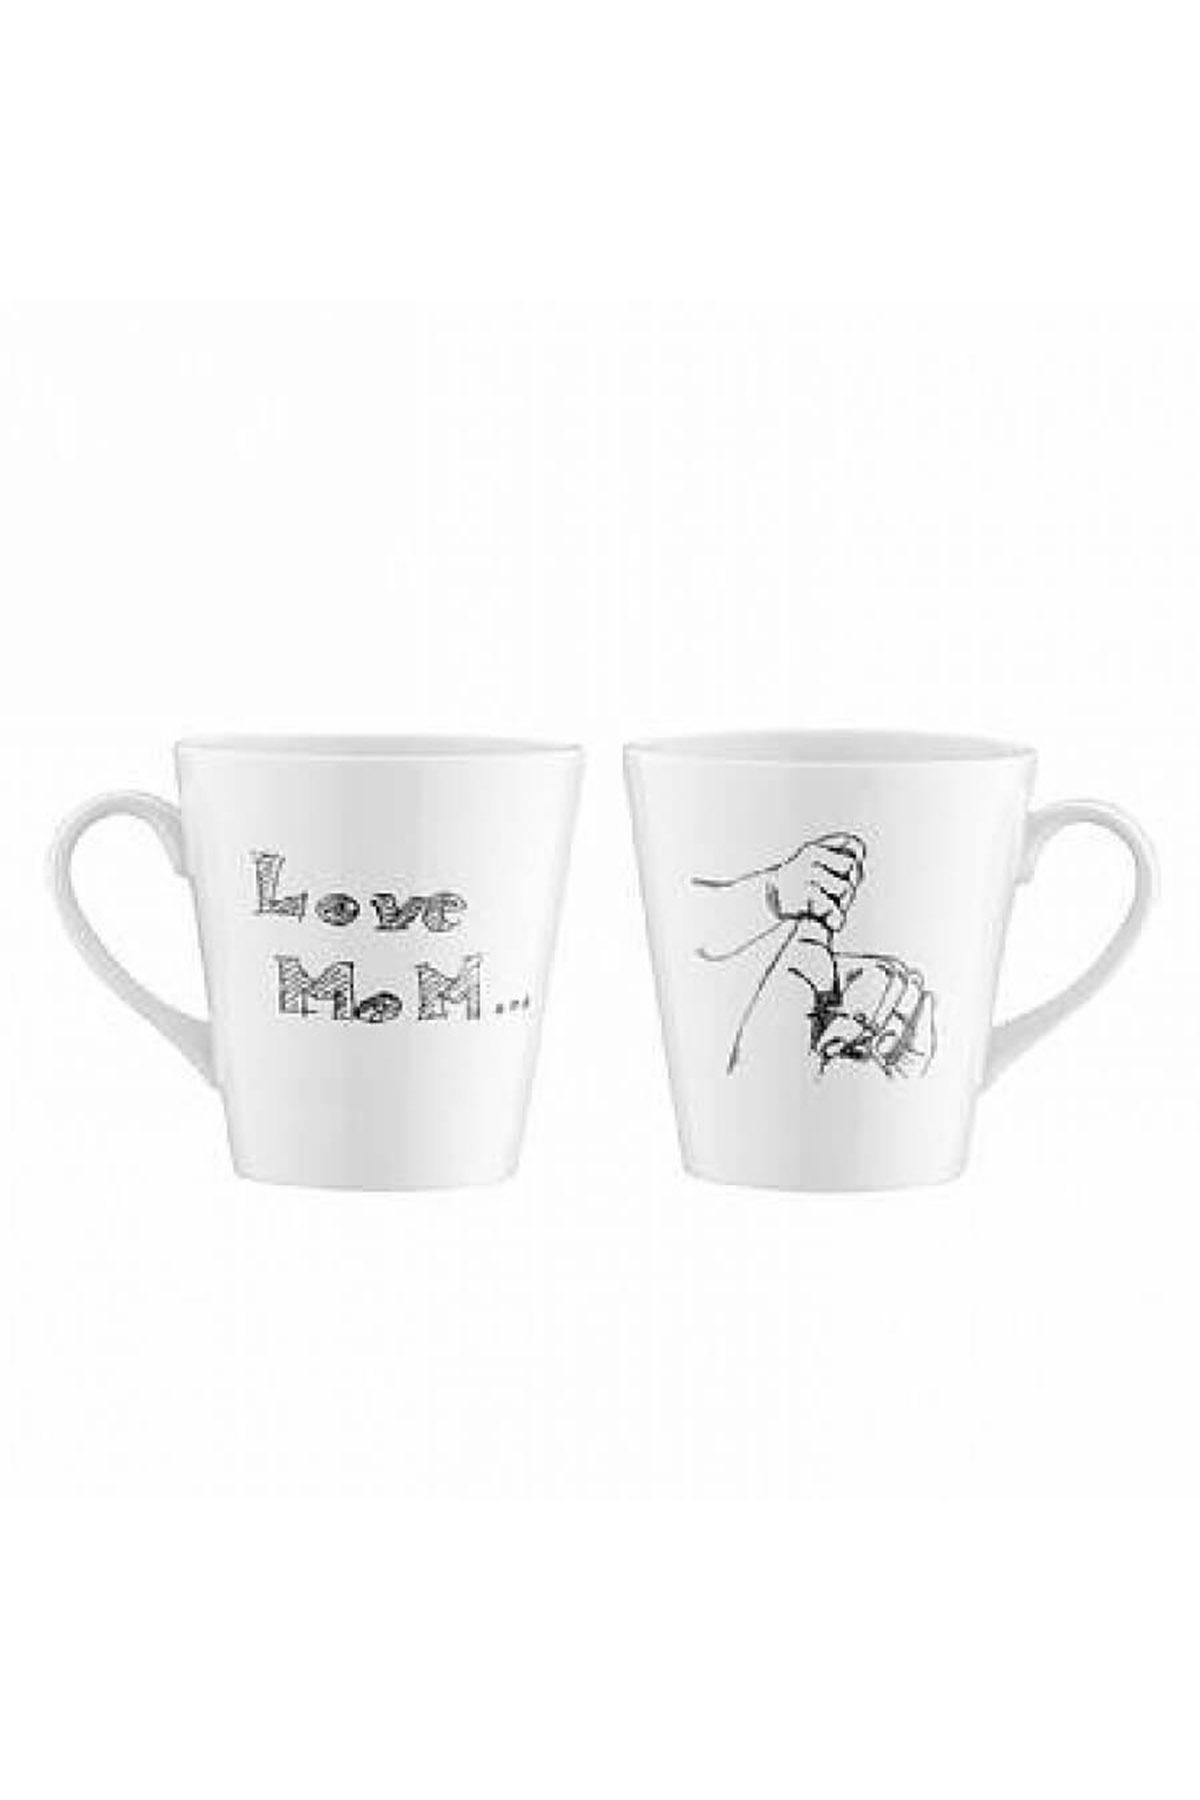 Kütahya Porselen - Kütahya Porselen 10227 Desen 2li Mug Bardak